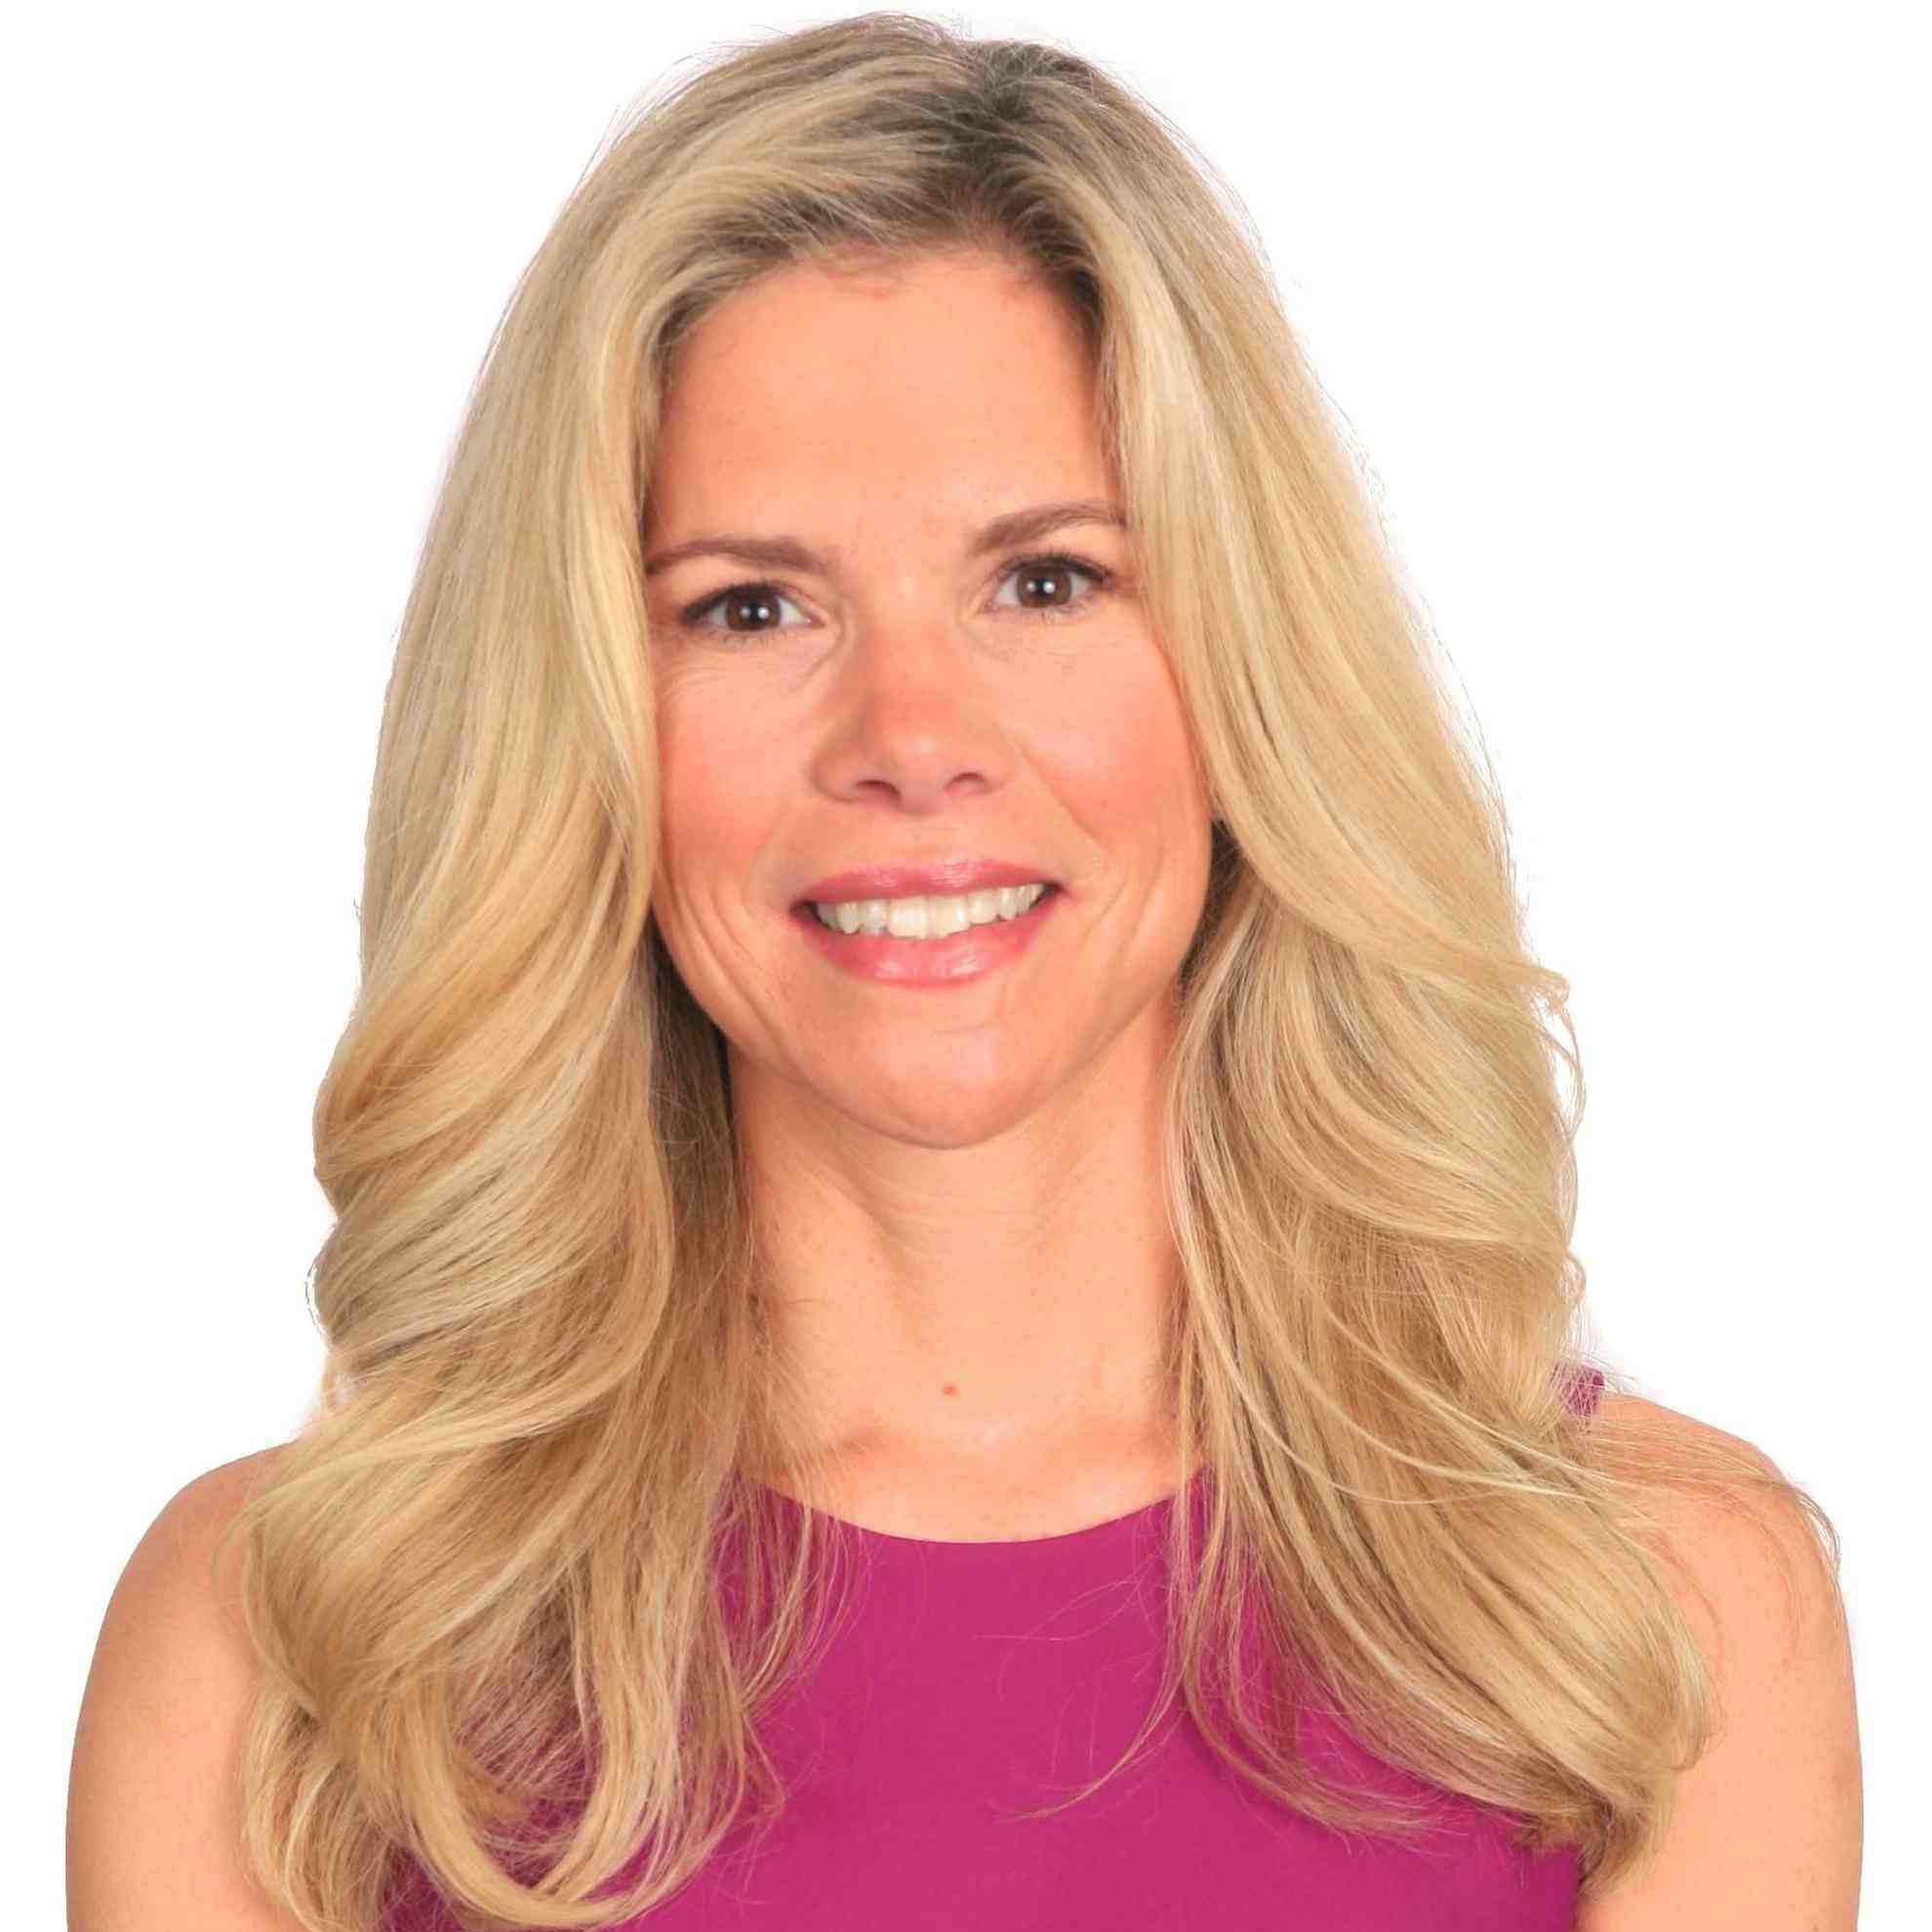 Photo of Kimberly Larson-Ohlsen, MD